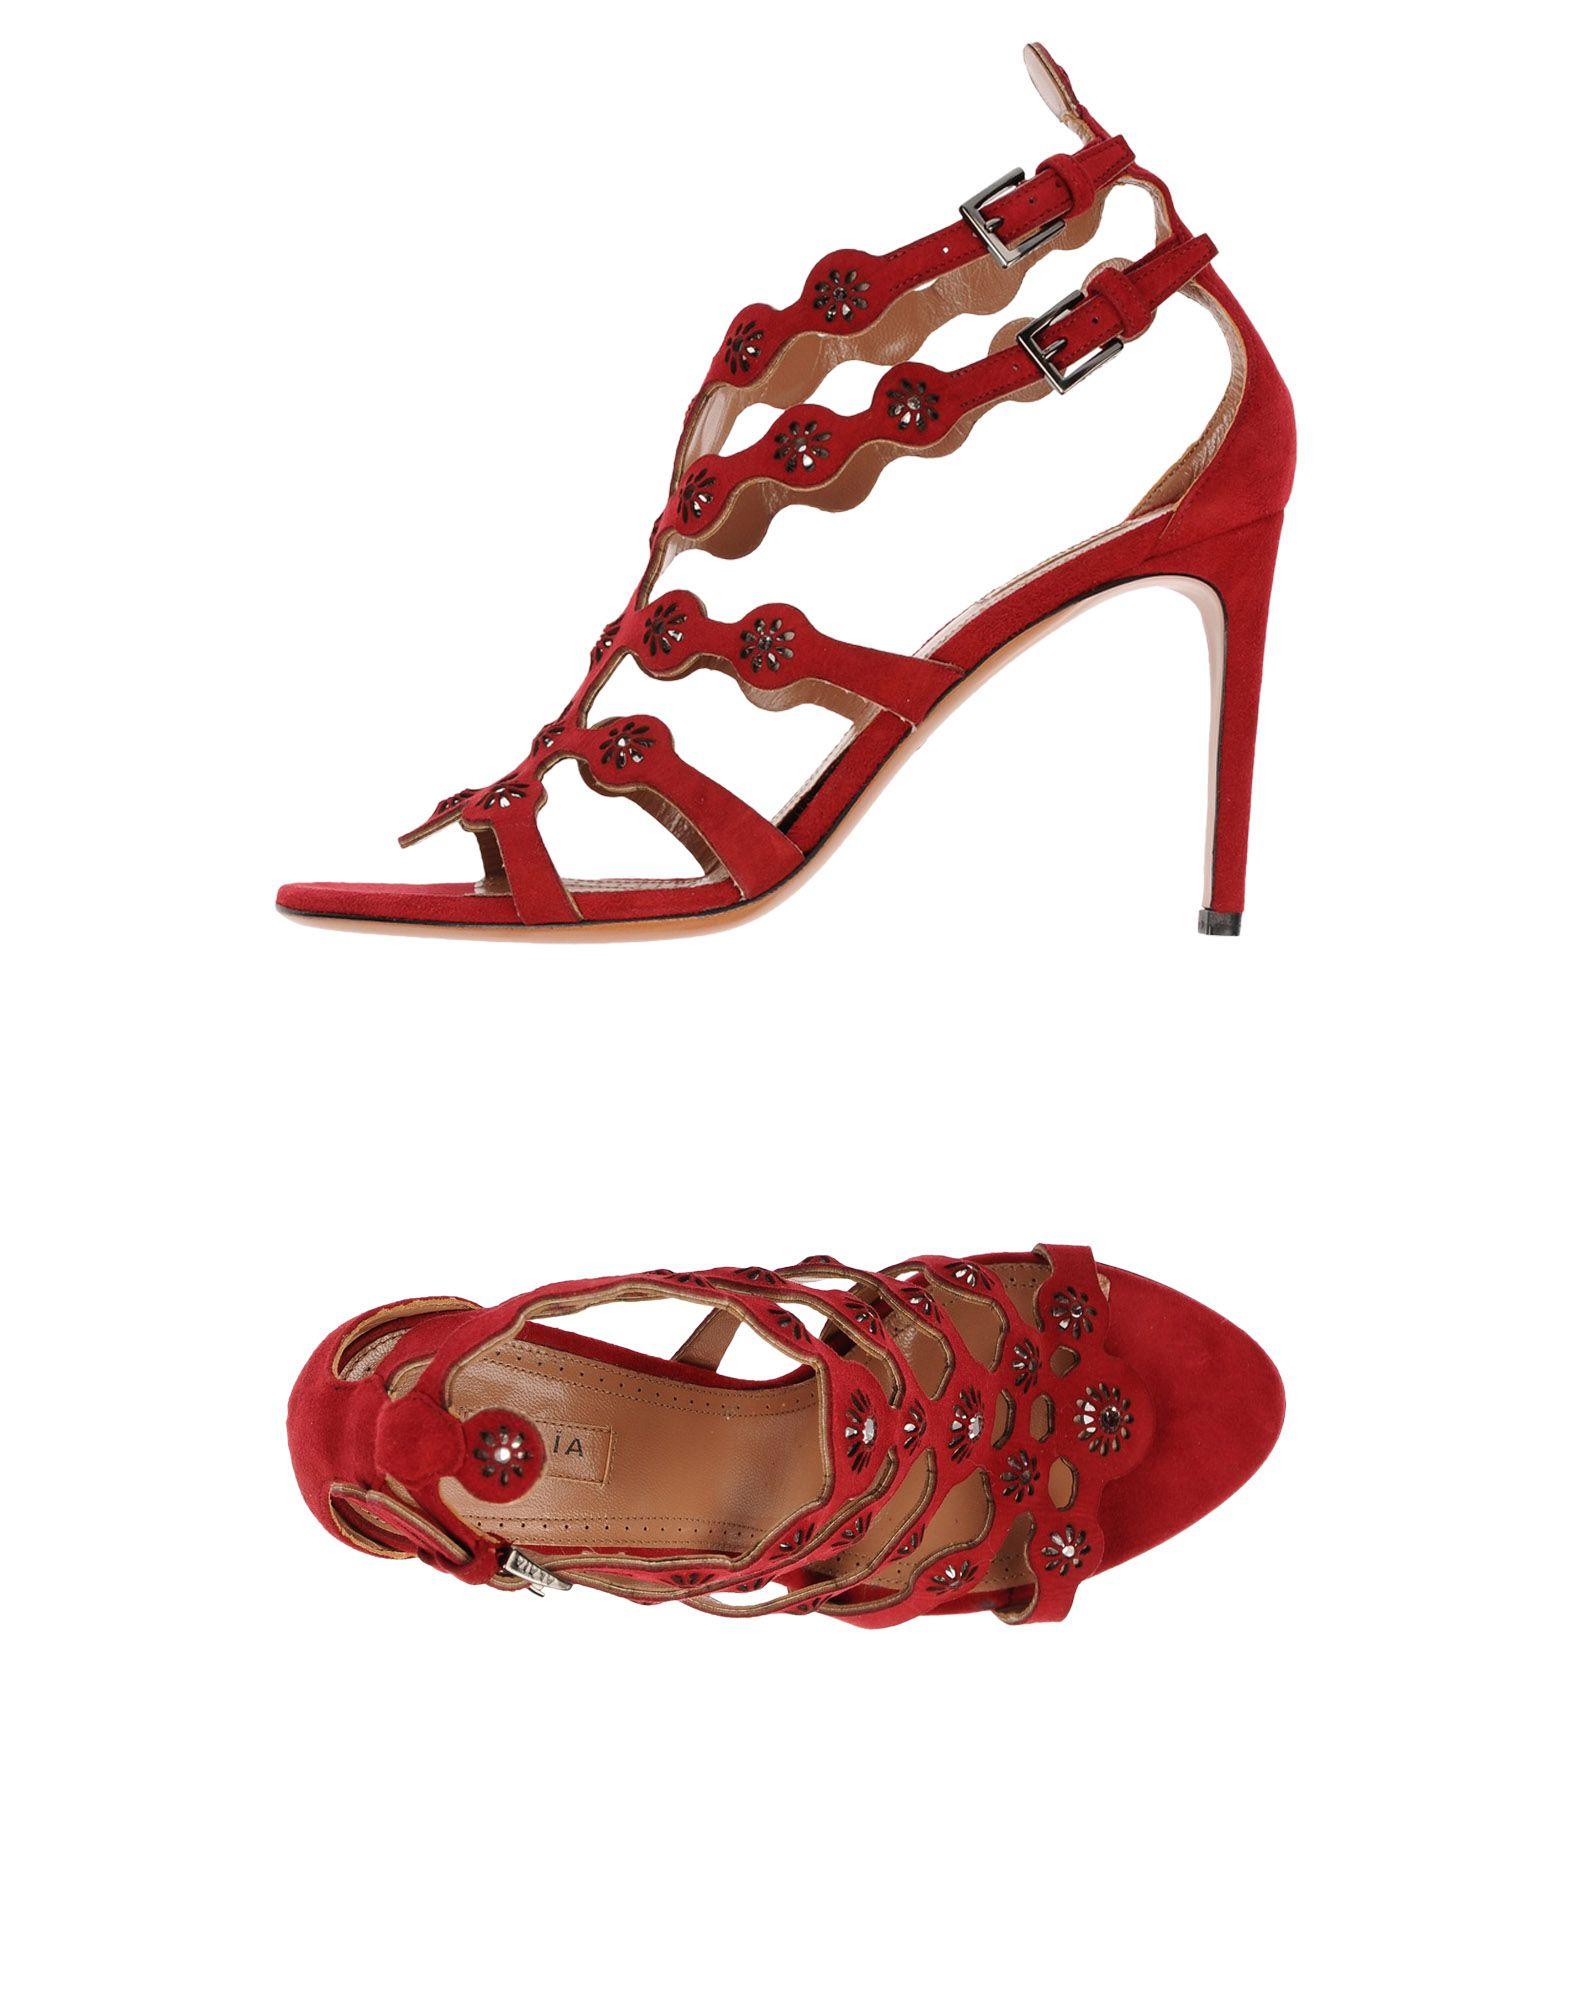 Zapatos casuales salvajes Sandalia Ala?a Mujer - Sandalias Ala?a  Púrpura Púrpura  f740f1